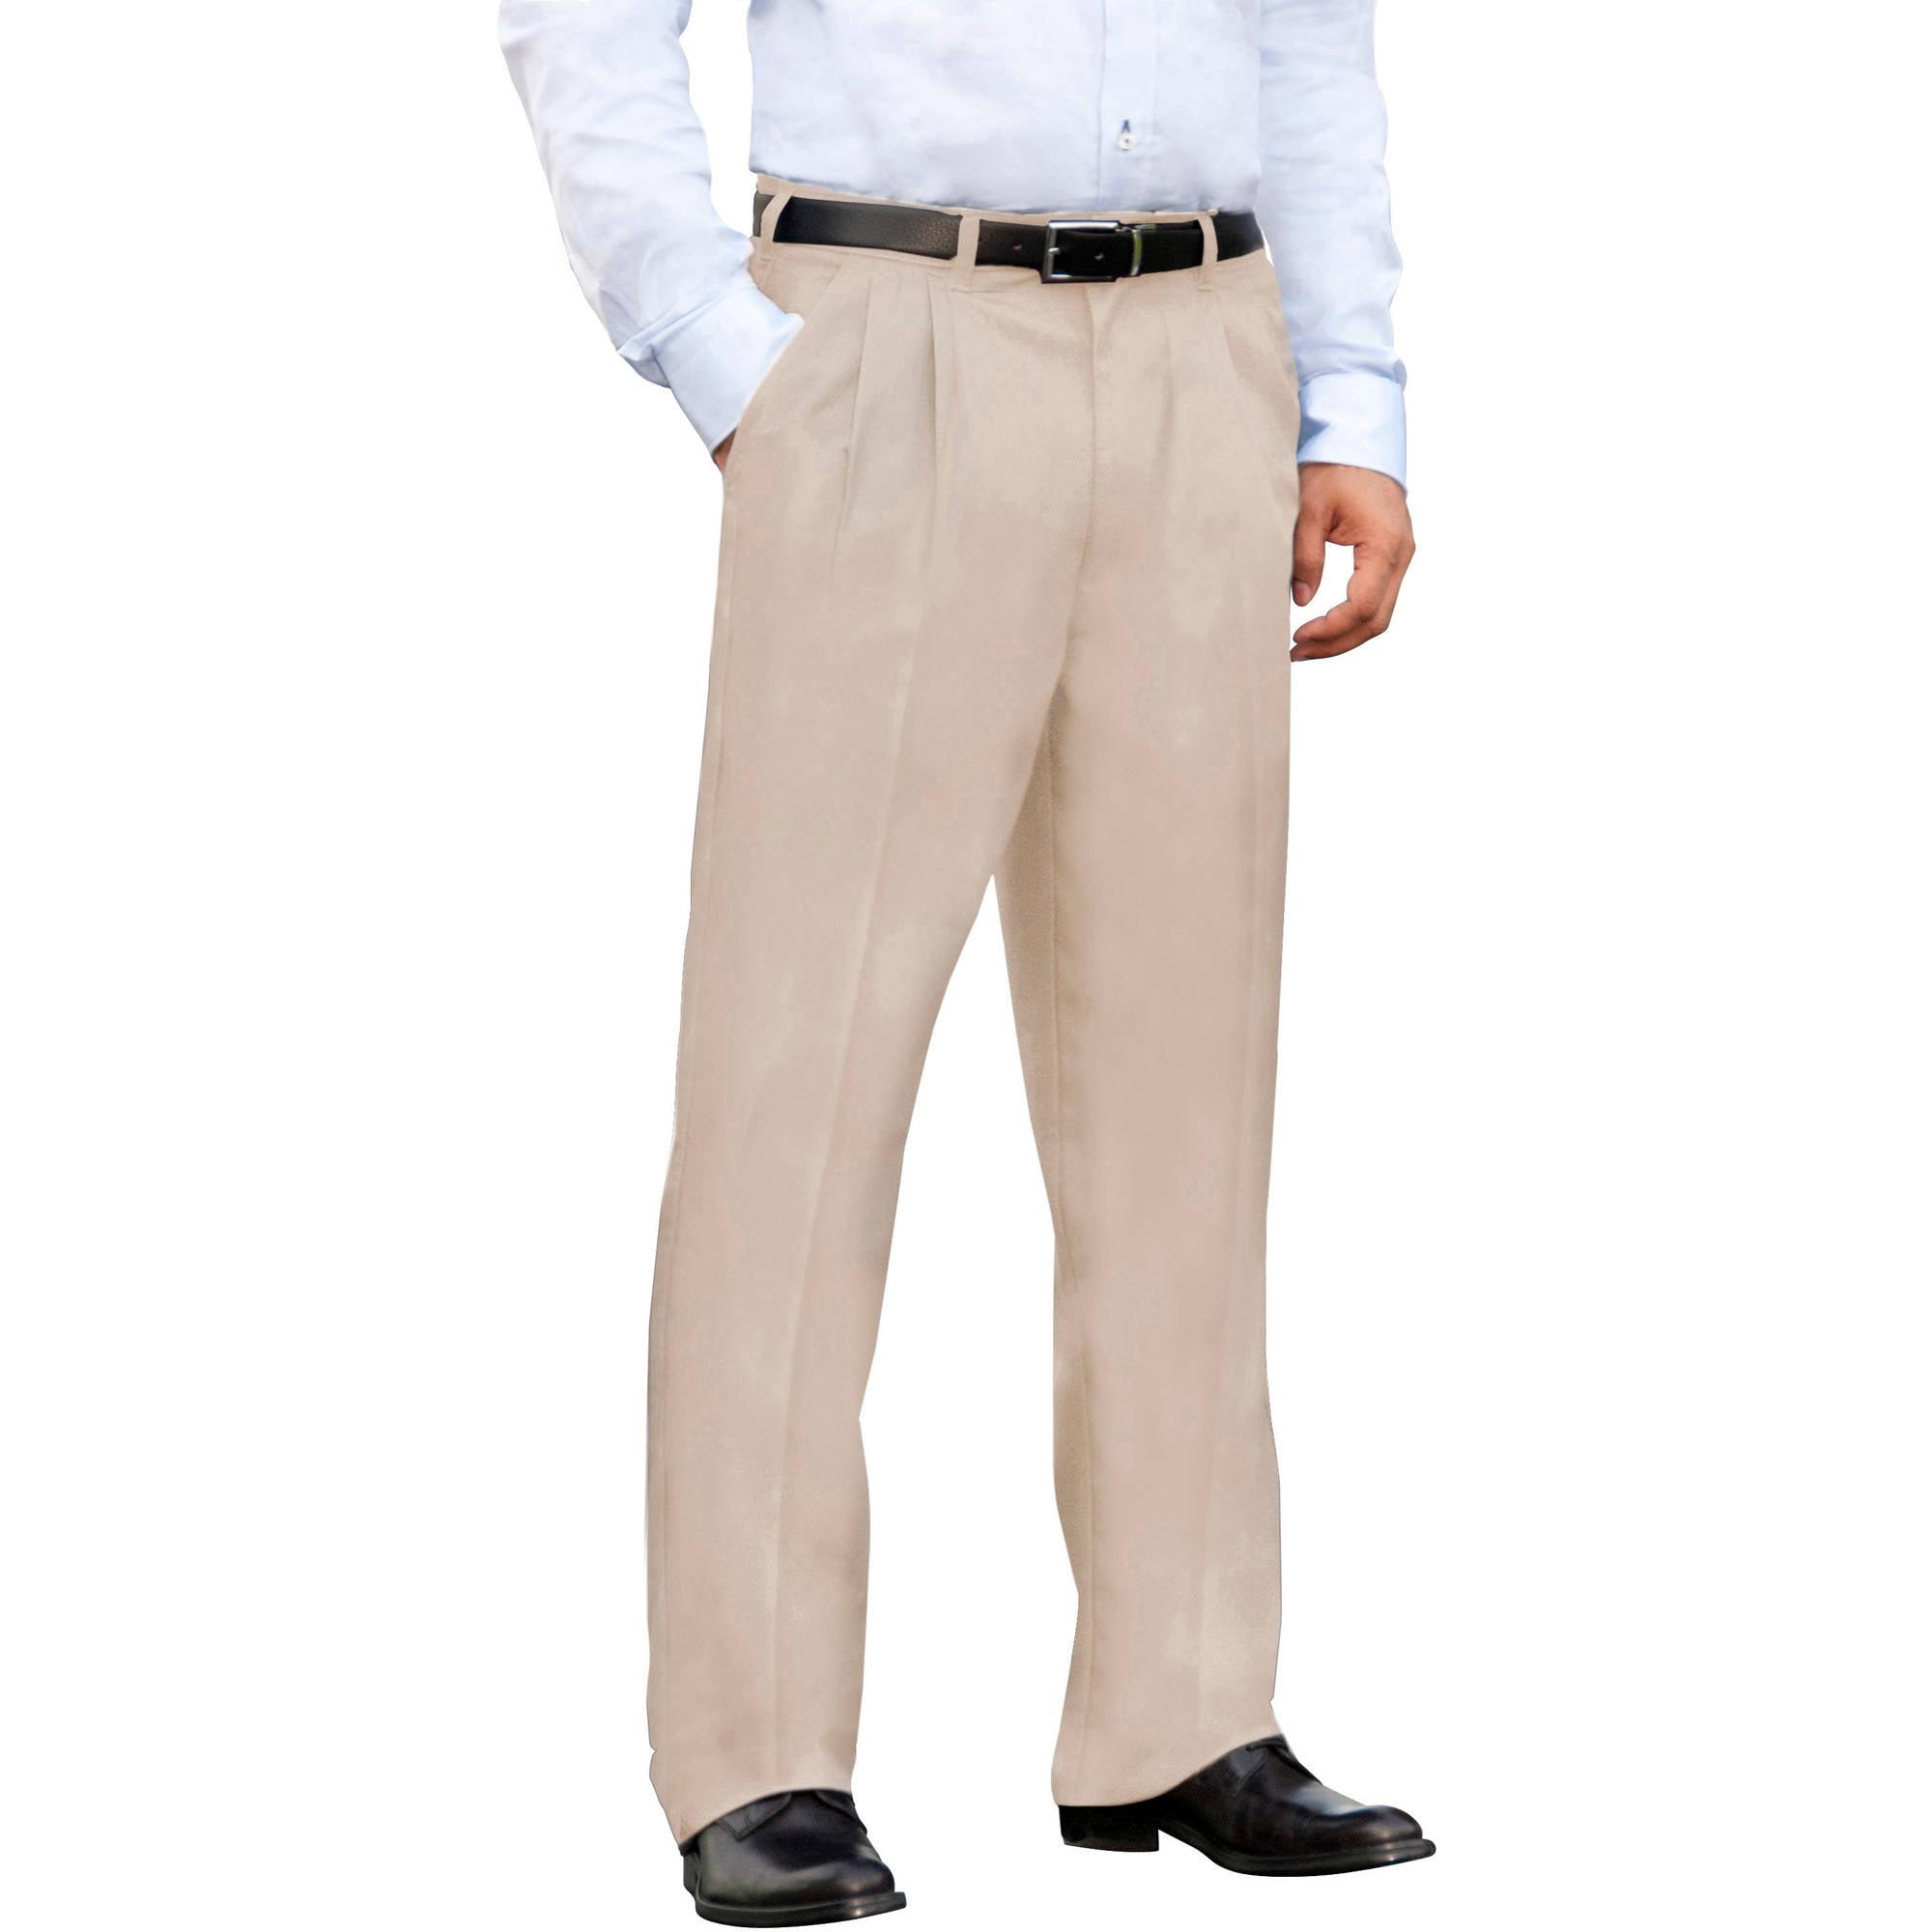 George - Big Men's Wrinkle-Resistant Pleat-Front Khaki Pants ...